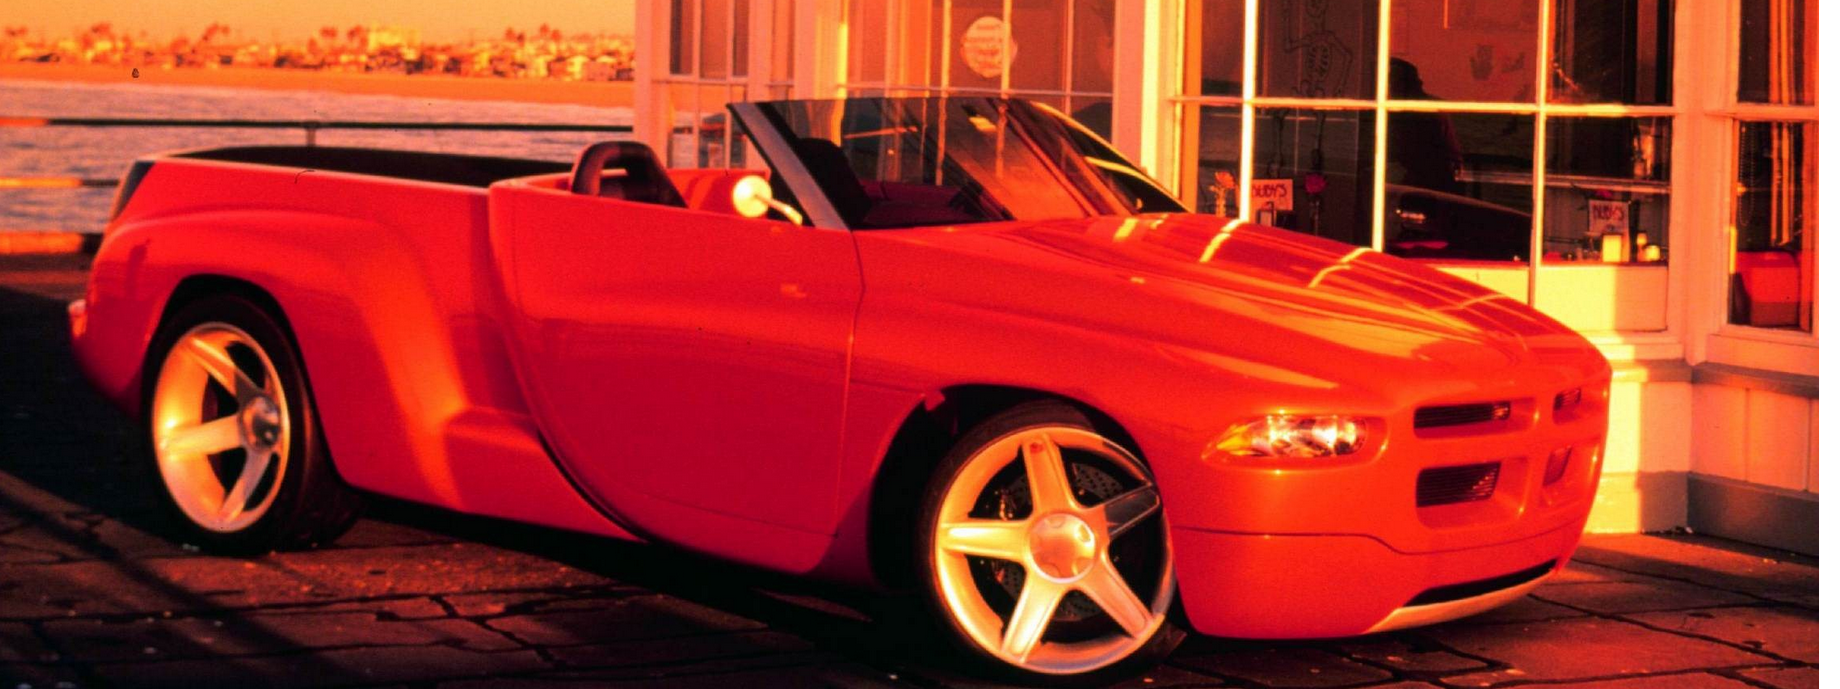 1997_Dodge_Sidewinder.png